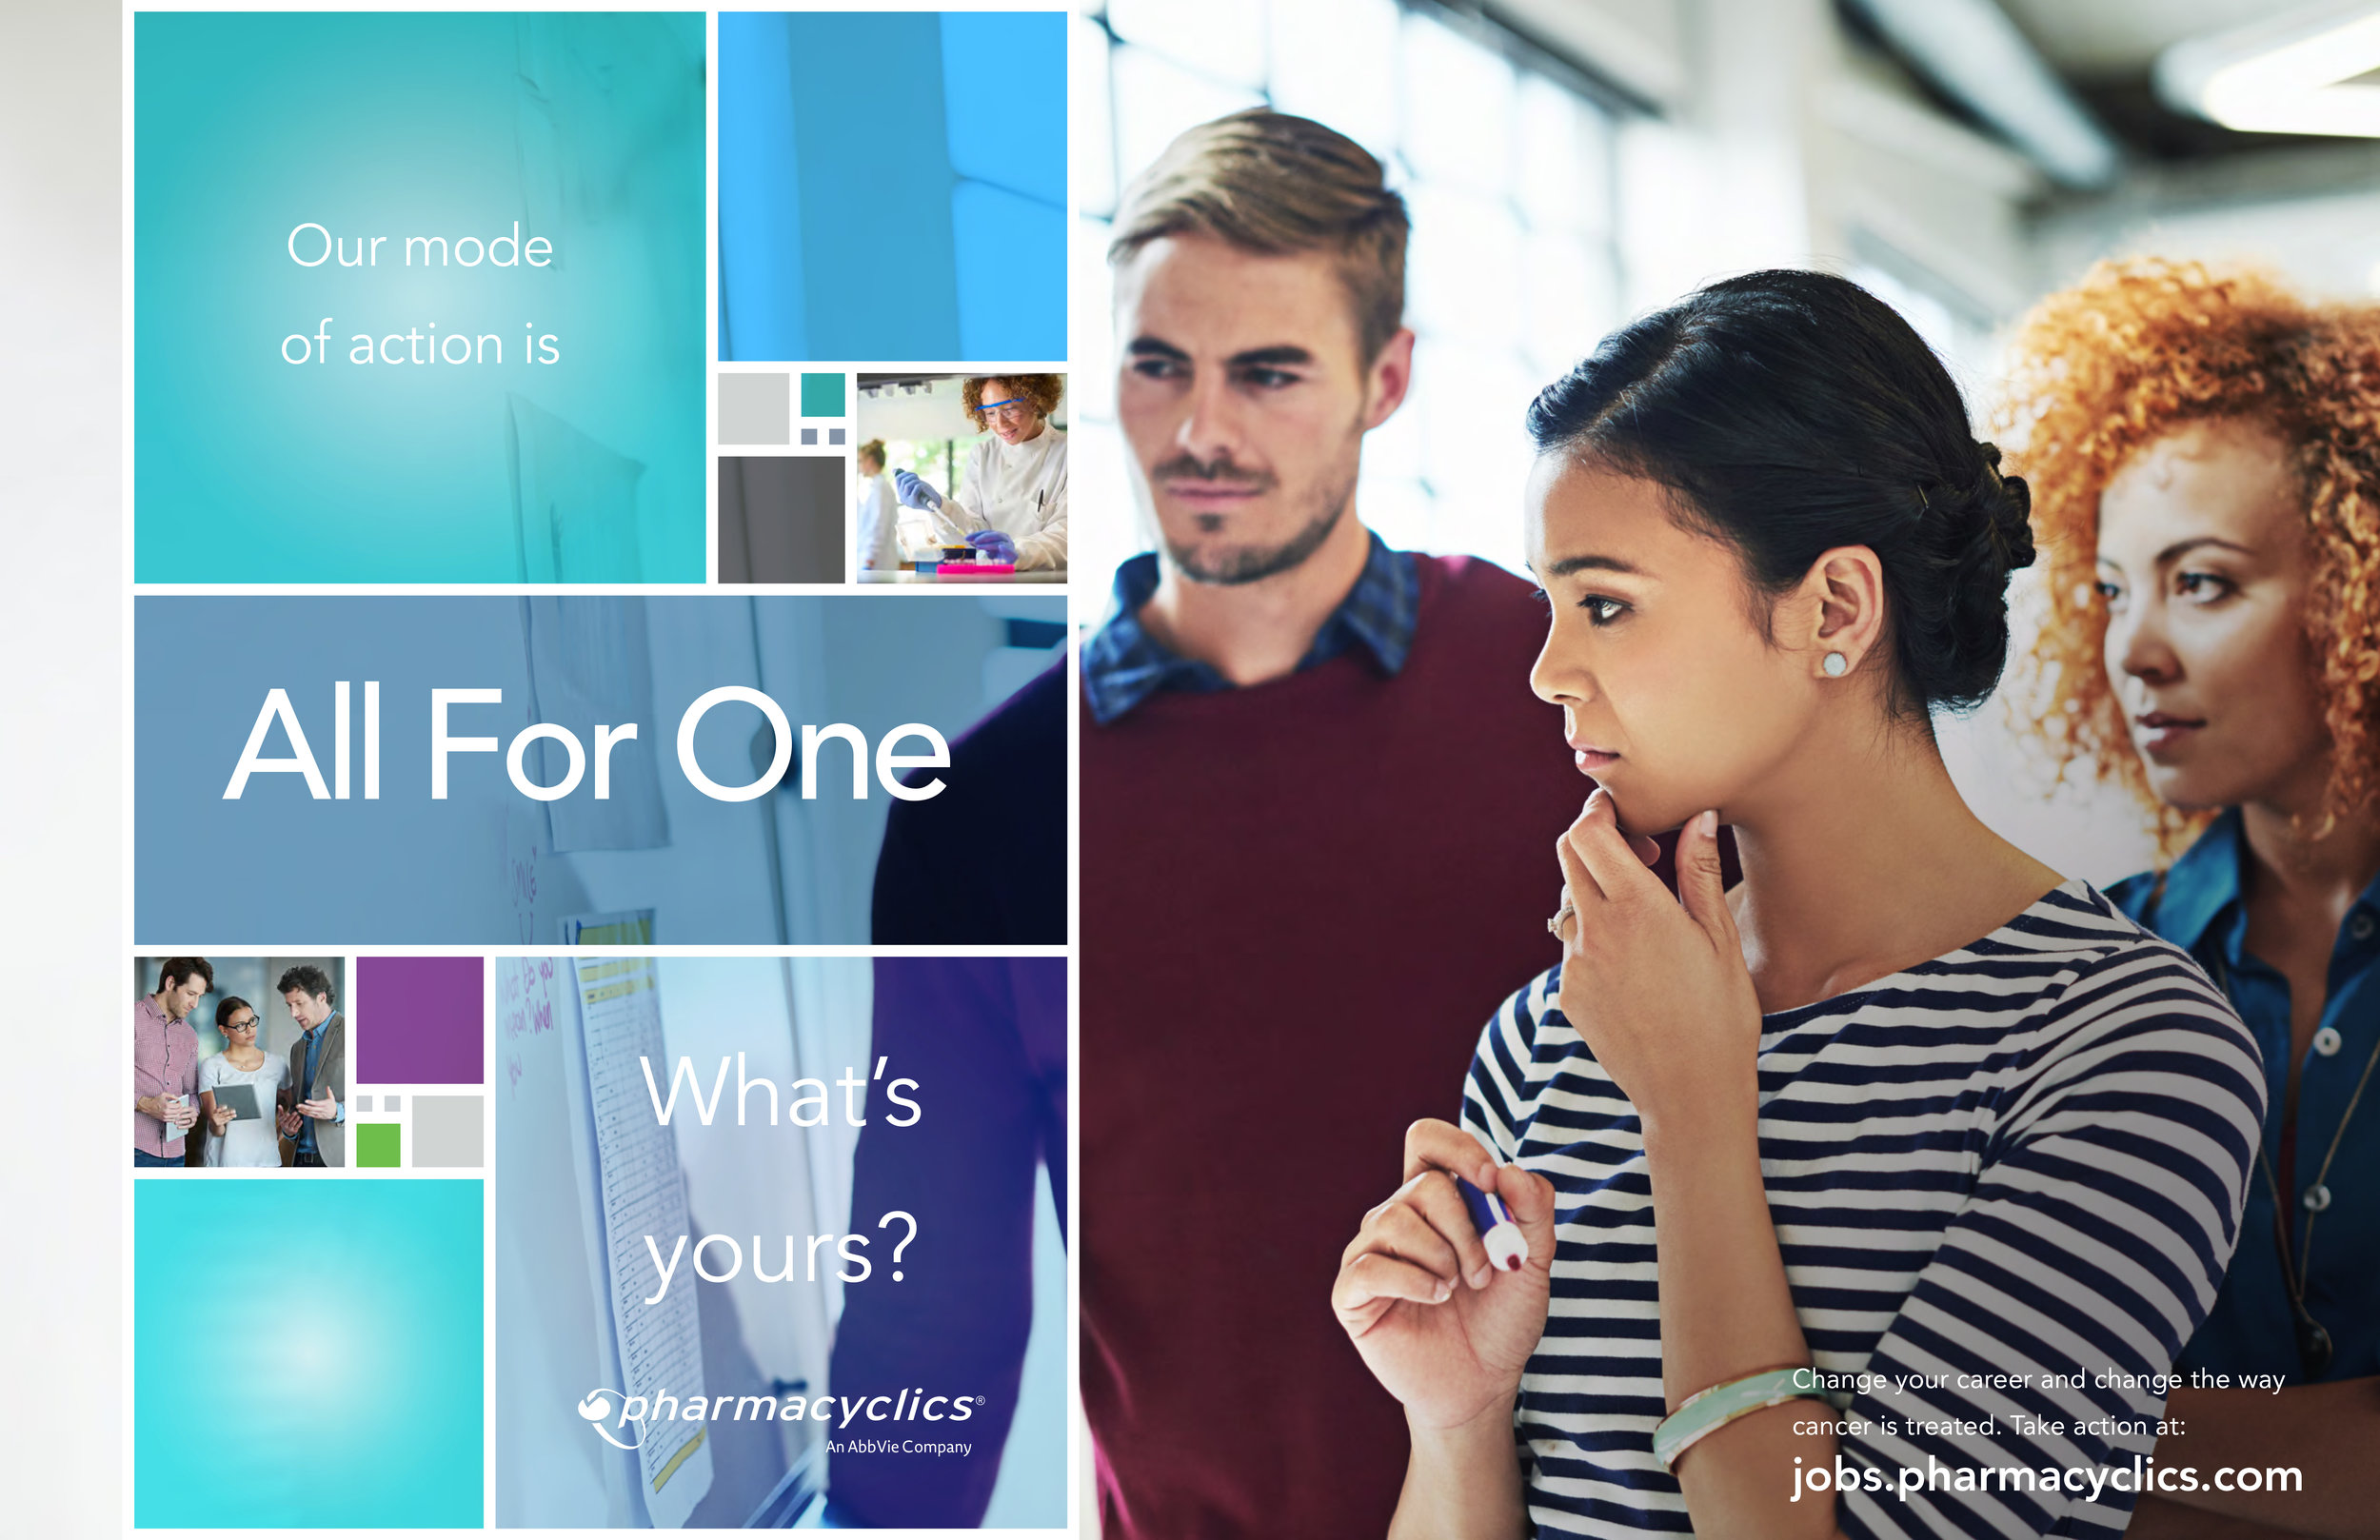 Pharmacyclics Corporate Brand Advertising